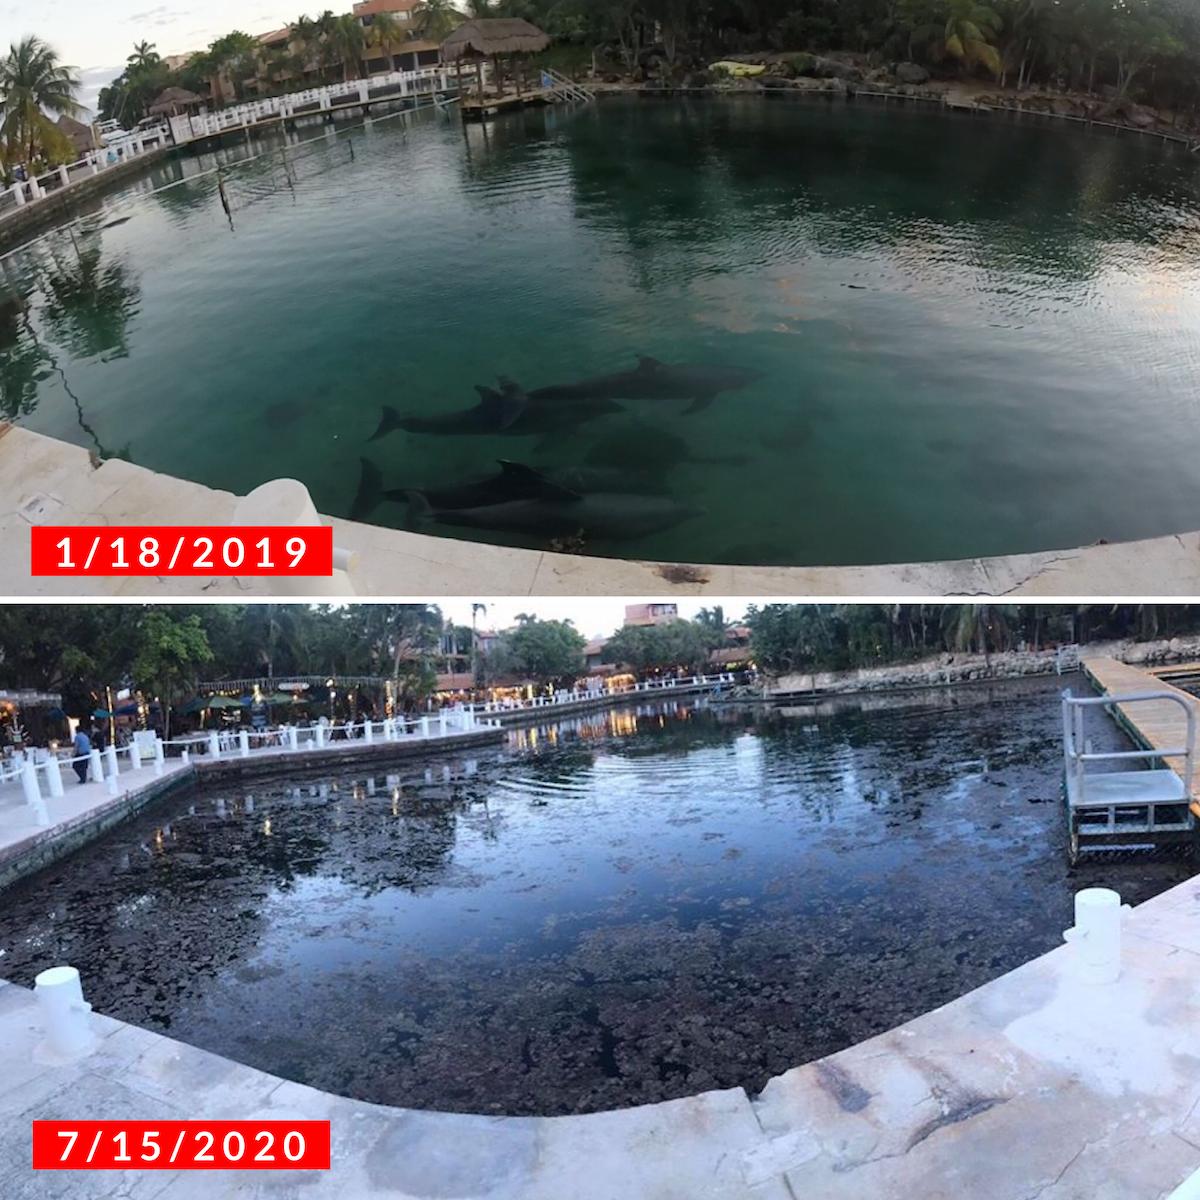 Réservoirs de dauphins à Dolphin Discovery Riviera Maya.